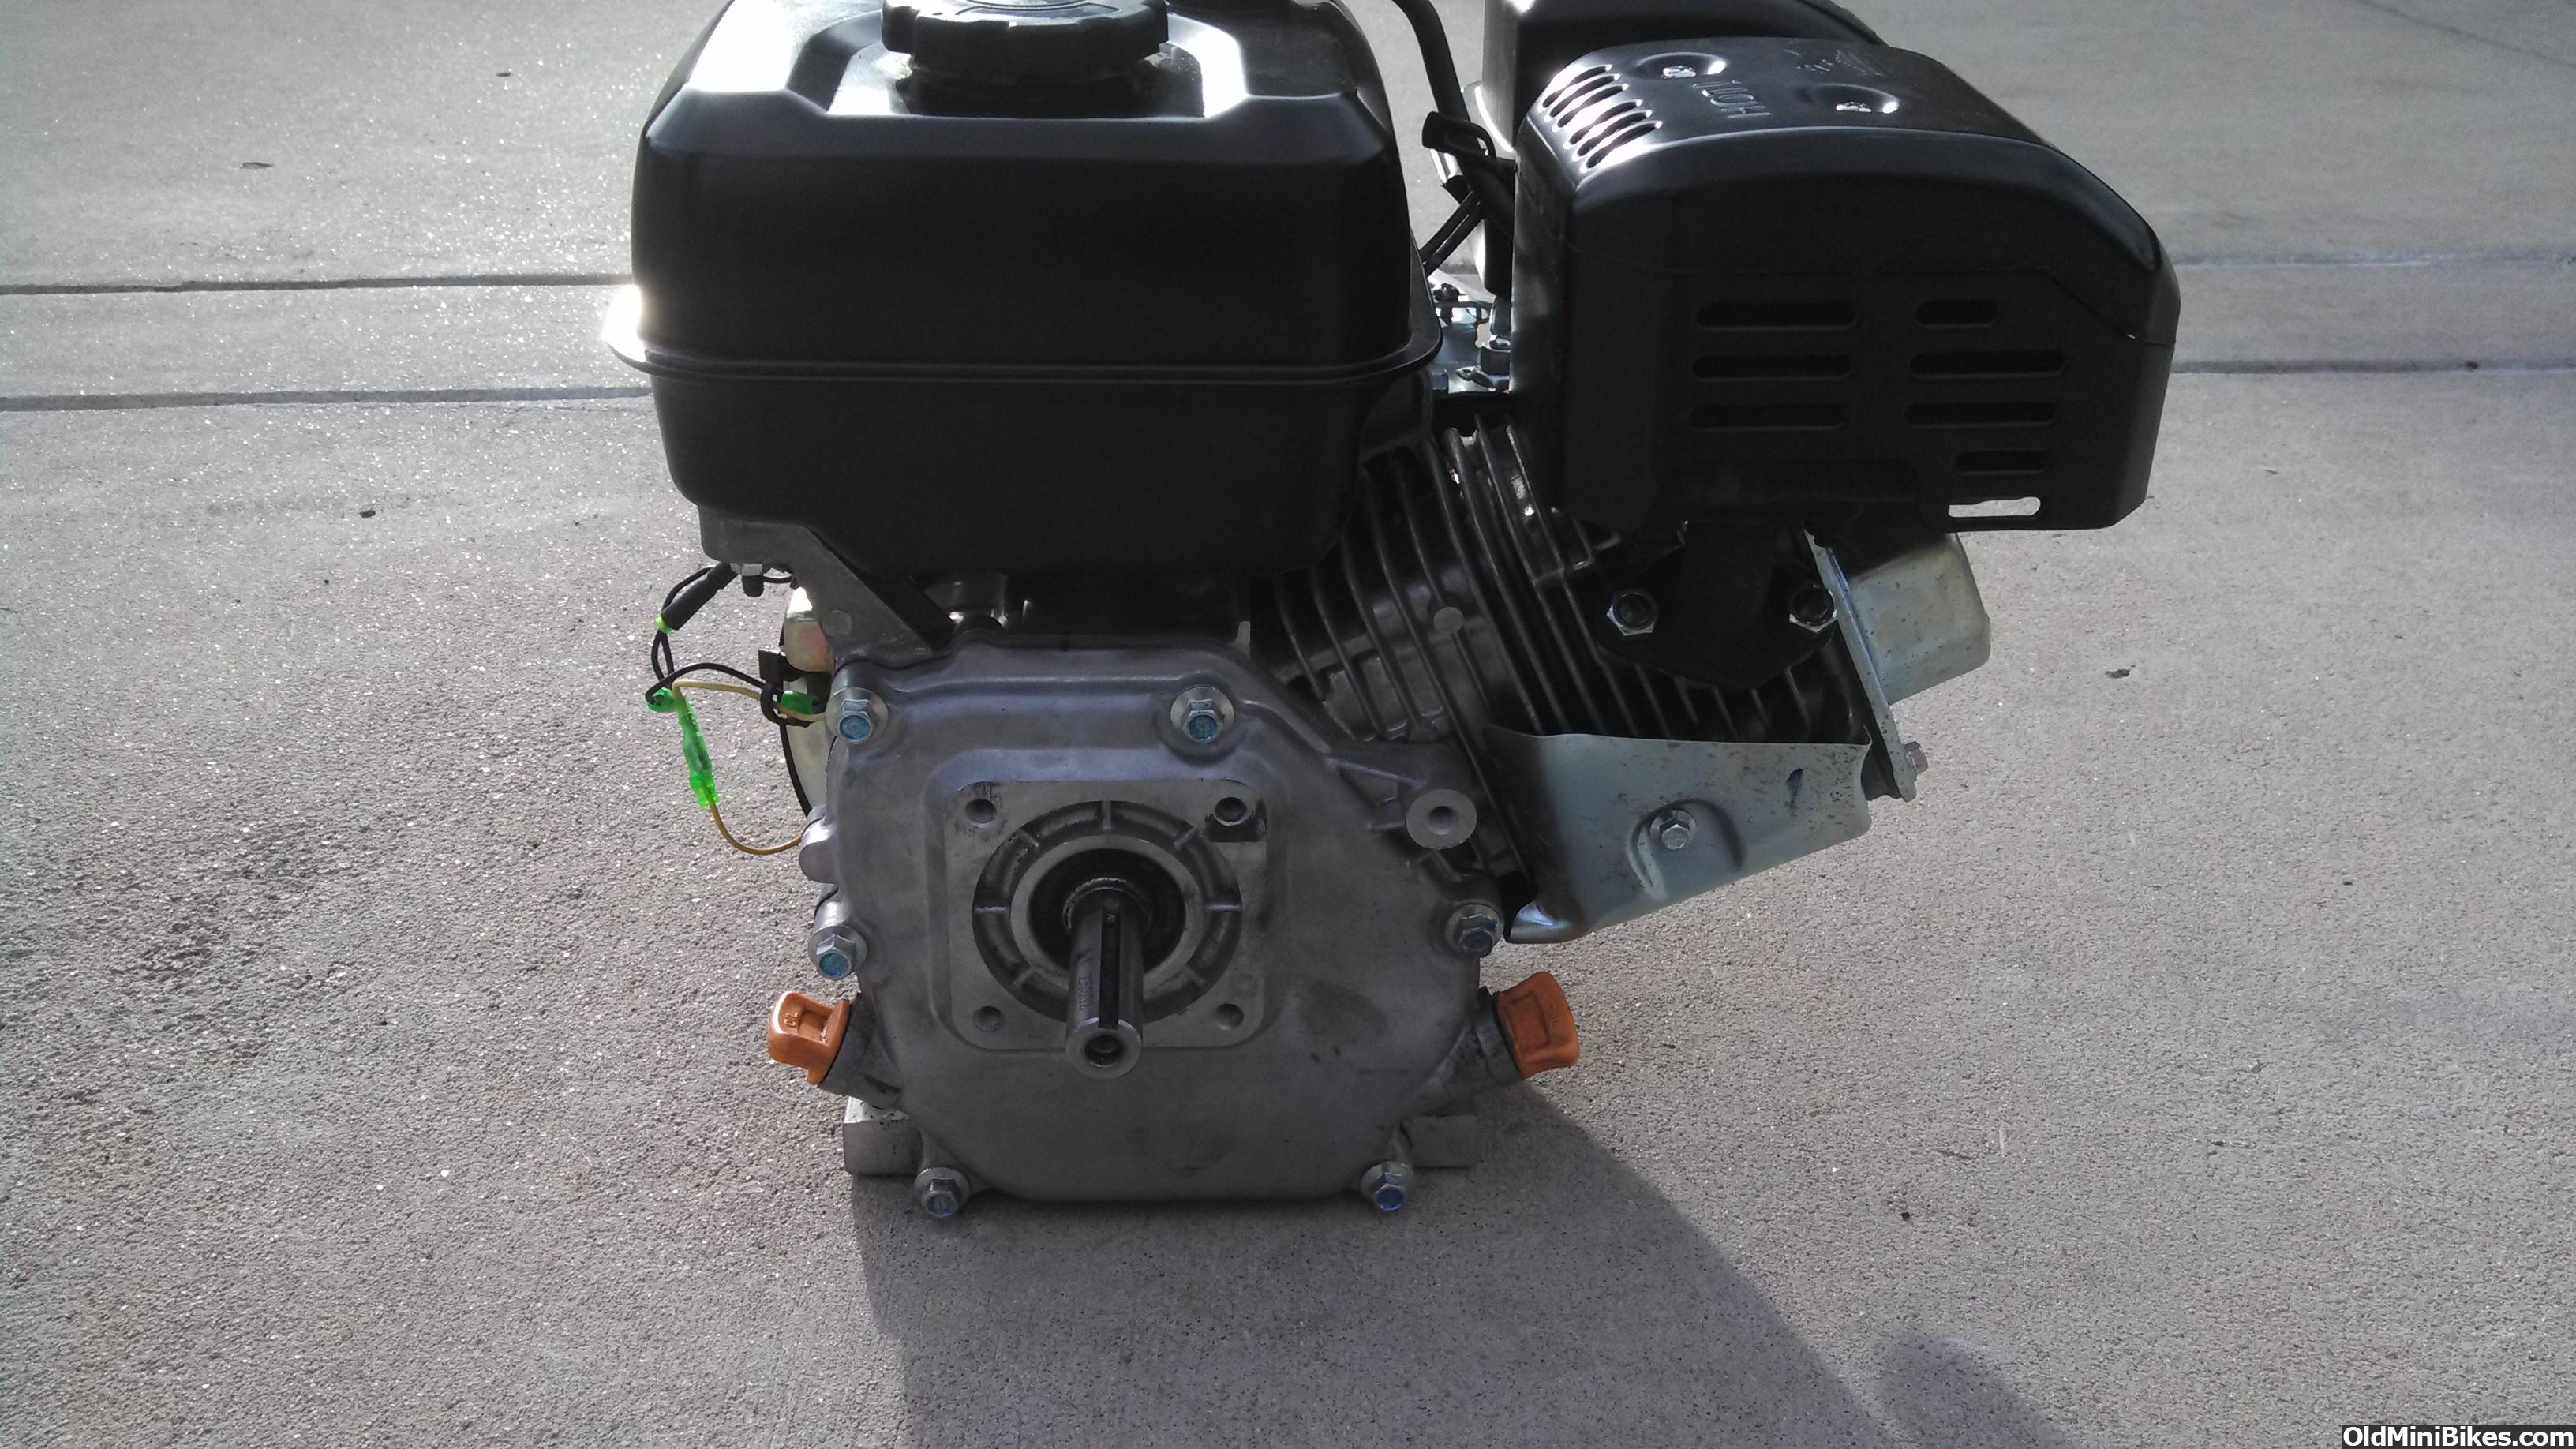 Predator Engines 212 CC